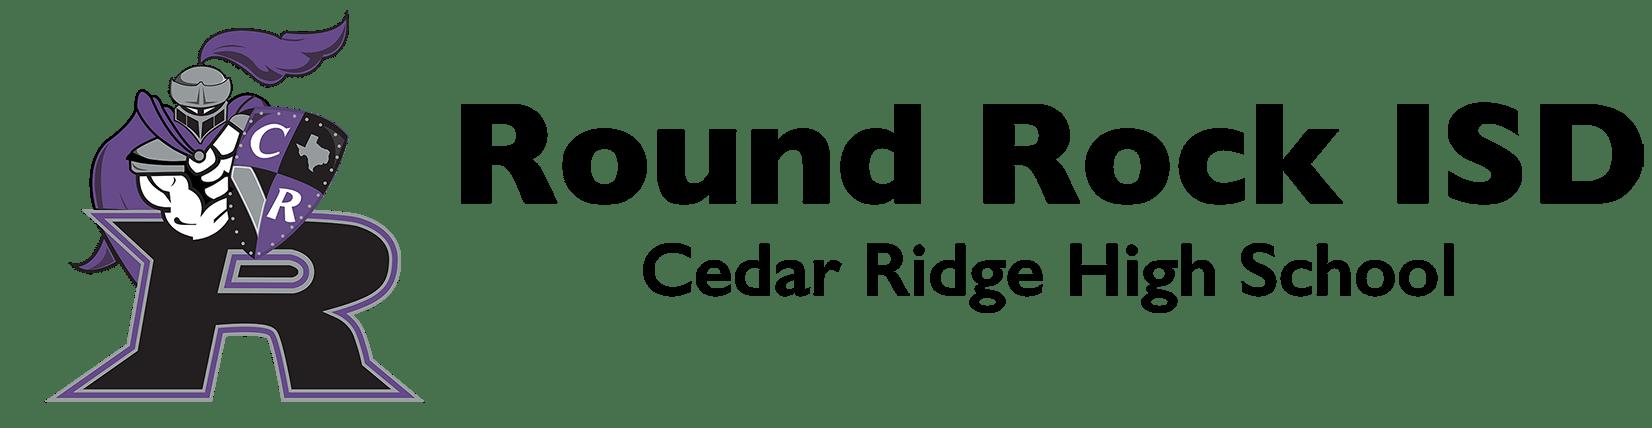 Cedar Ridge High School